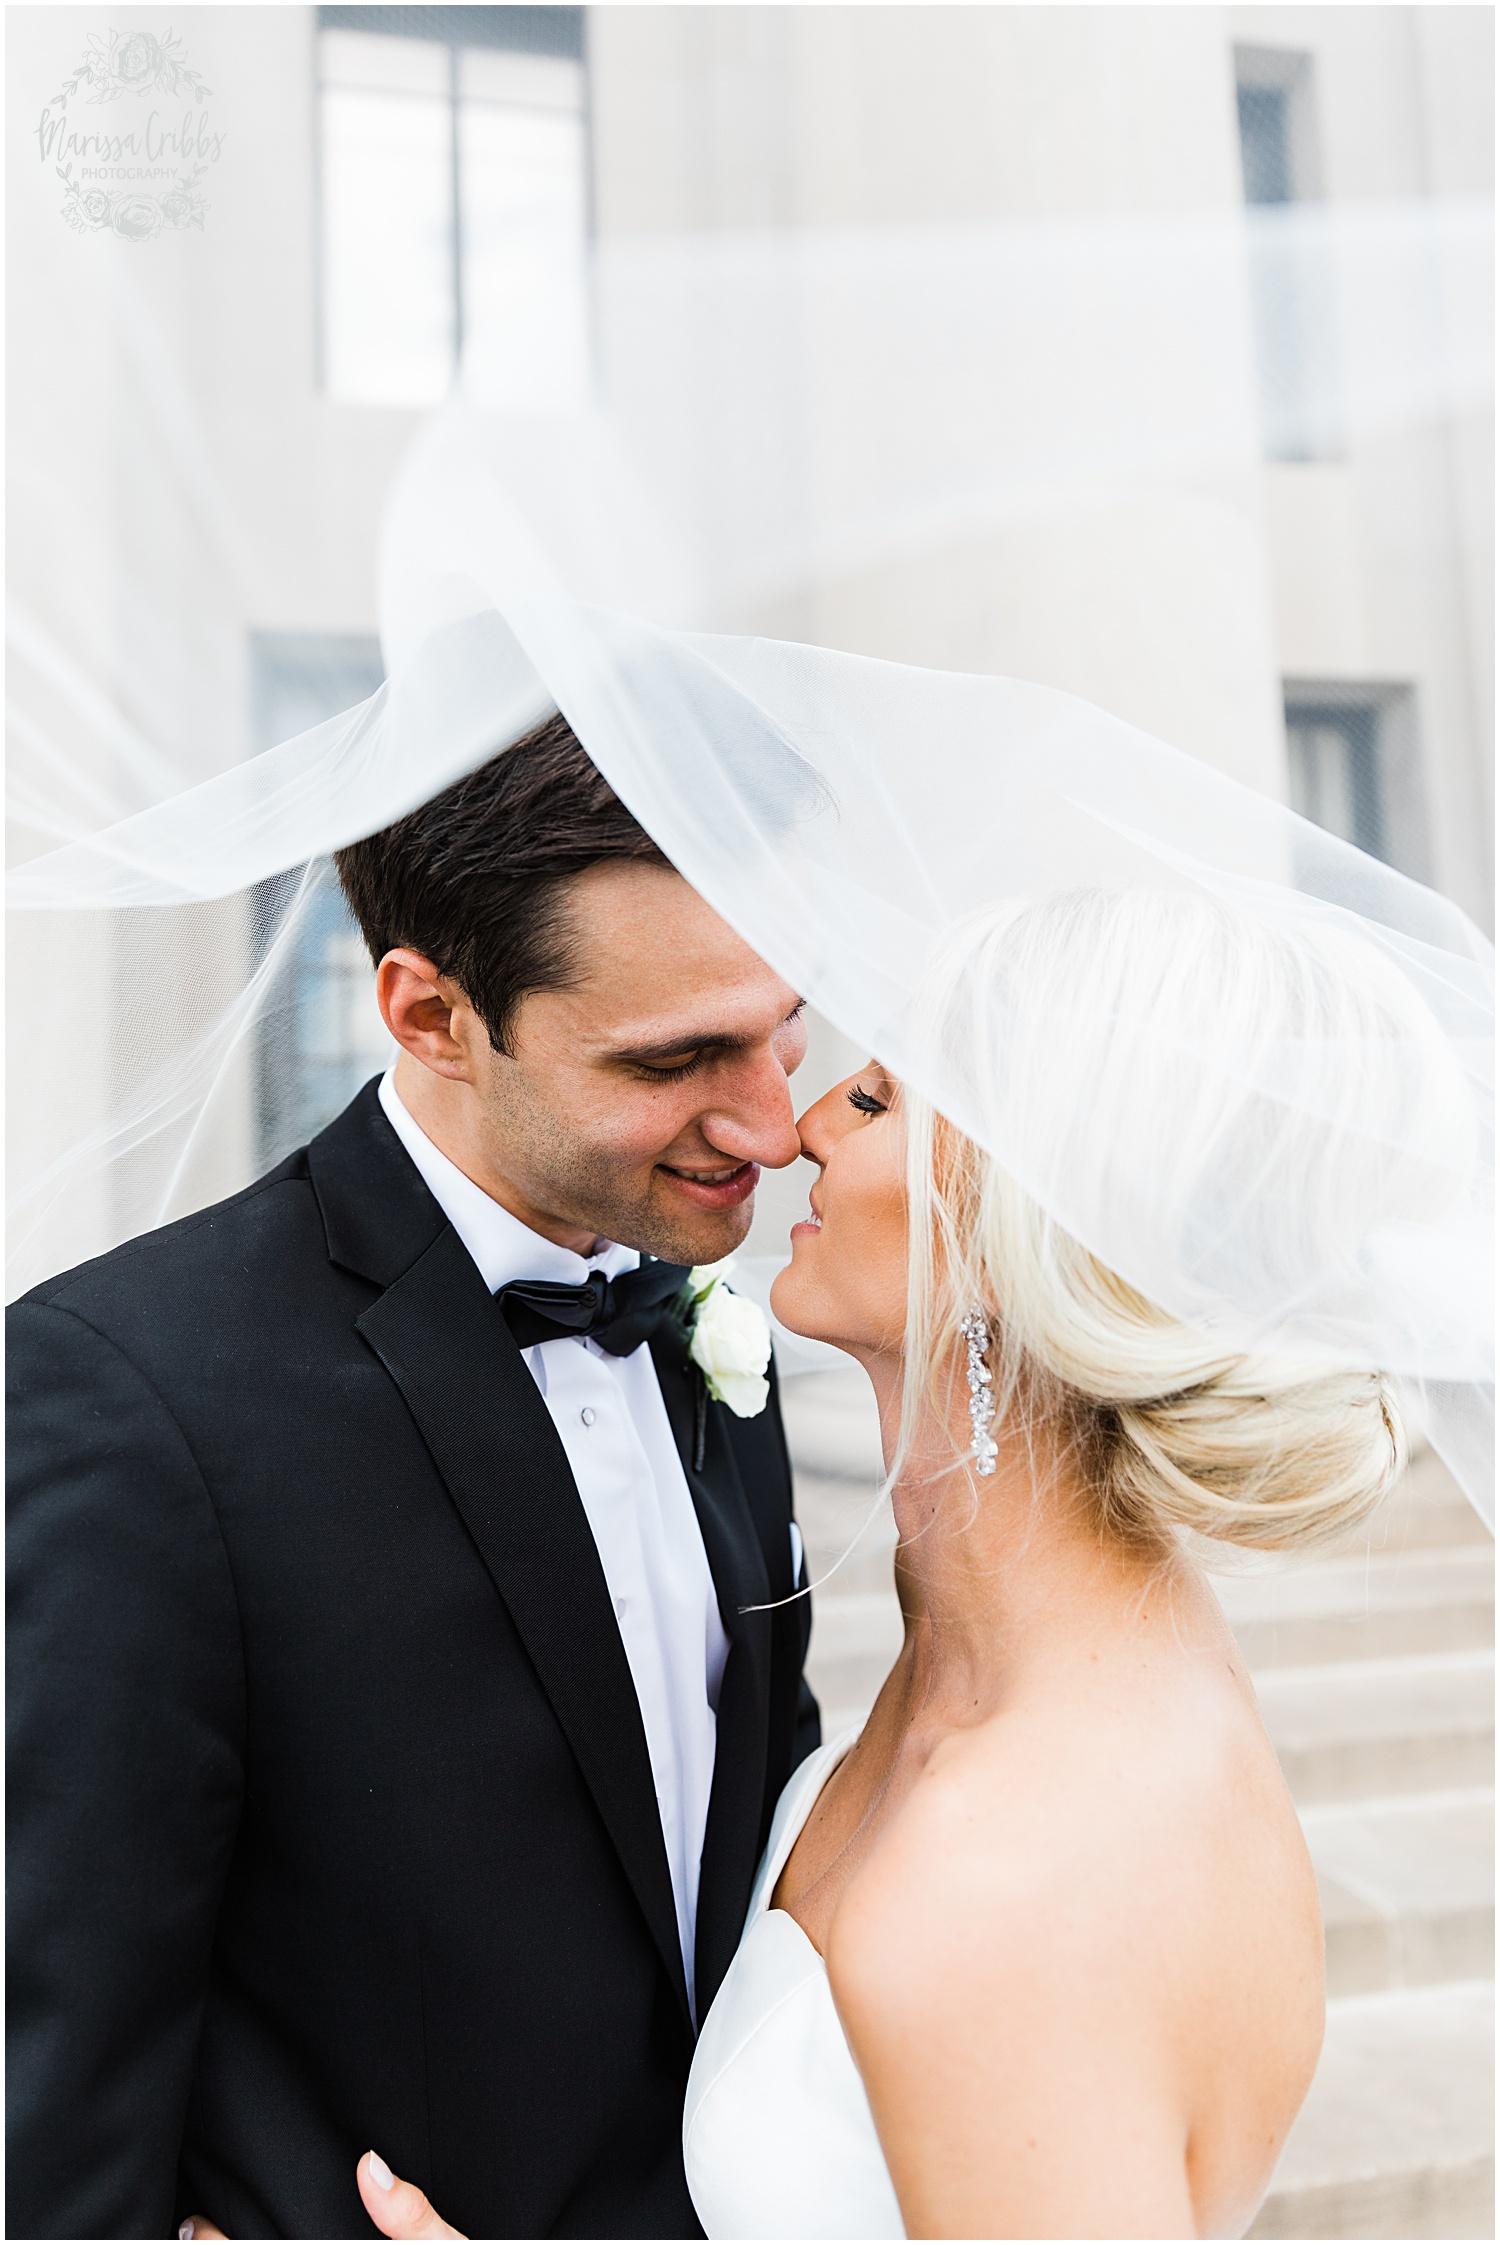 NOLL WEDDING | THE BRASS ON BALTIMORE | MARISSA CRIBBS PHOTOGRAPHY_6324.jpg